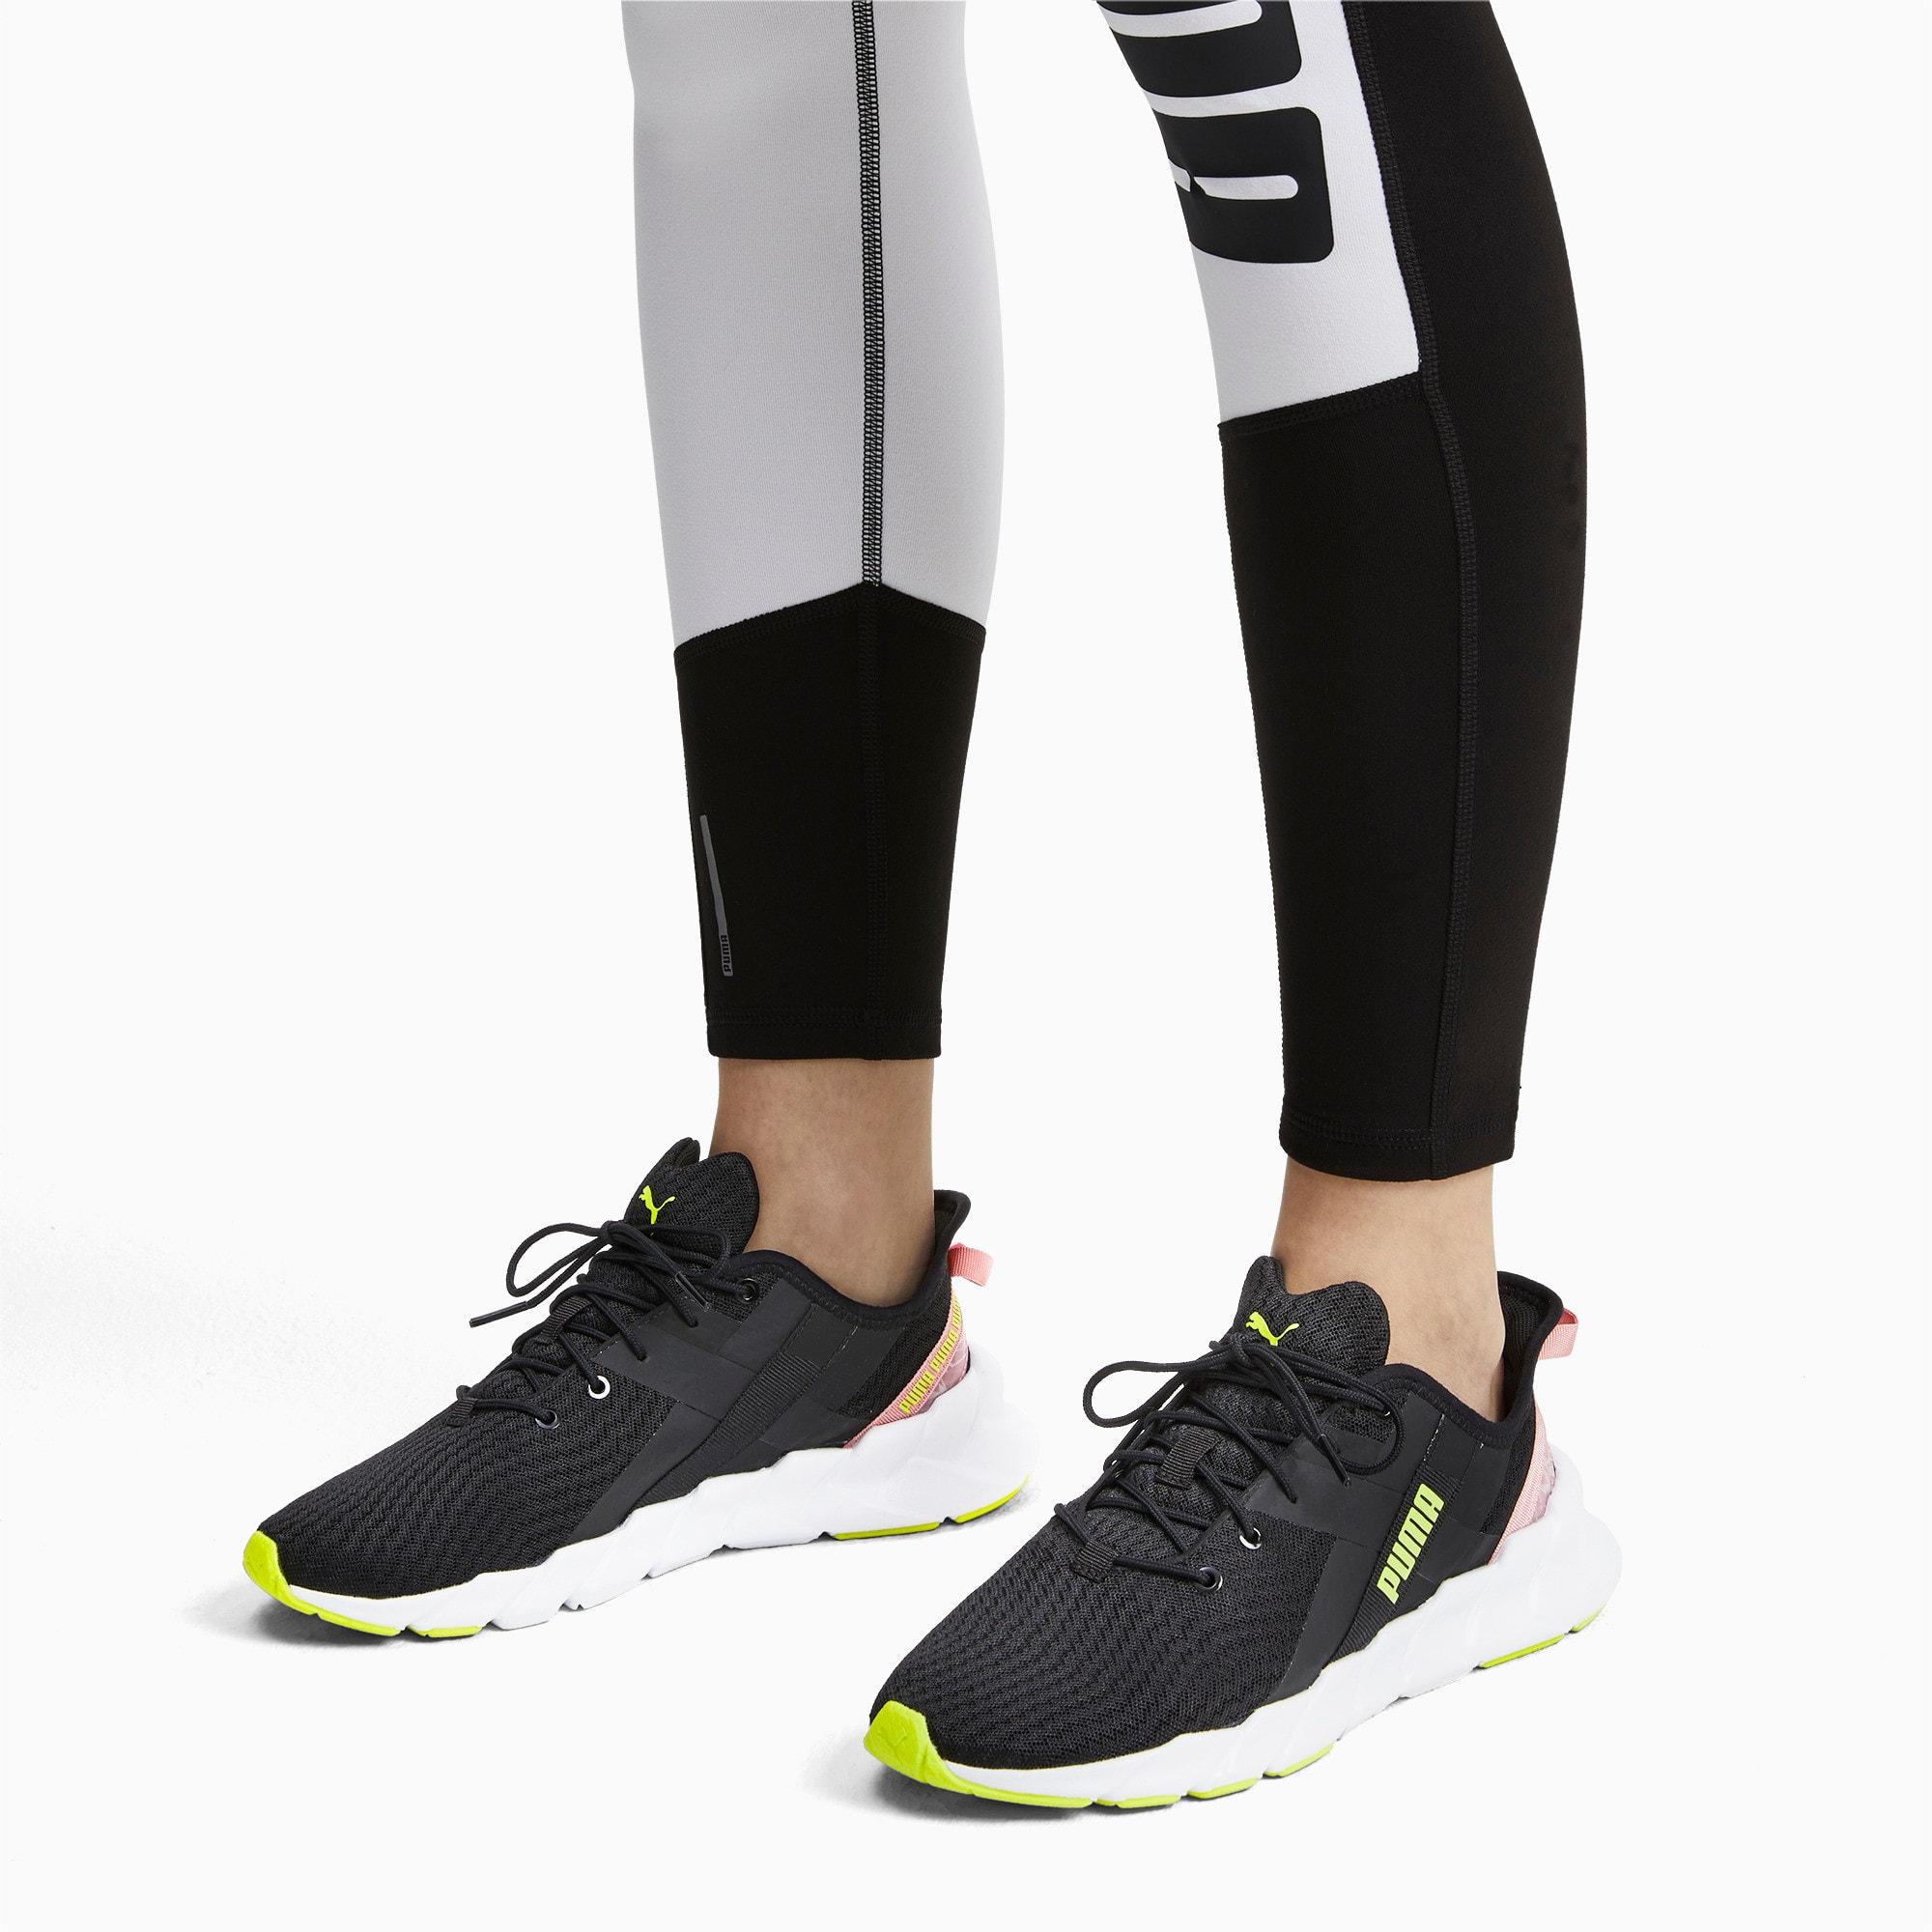 Thumbnail 2 of Weave XT Shift Women's Training Shoes, Puma Black-Puma White, medium